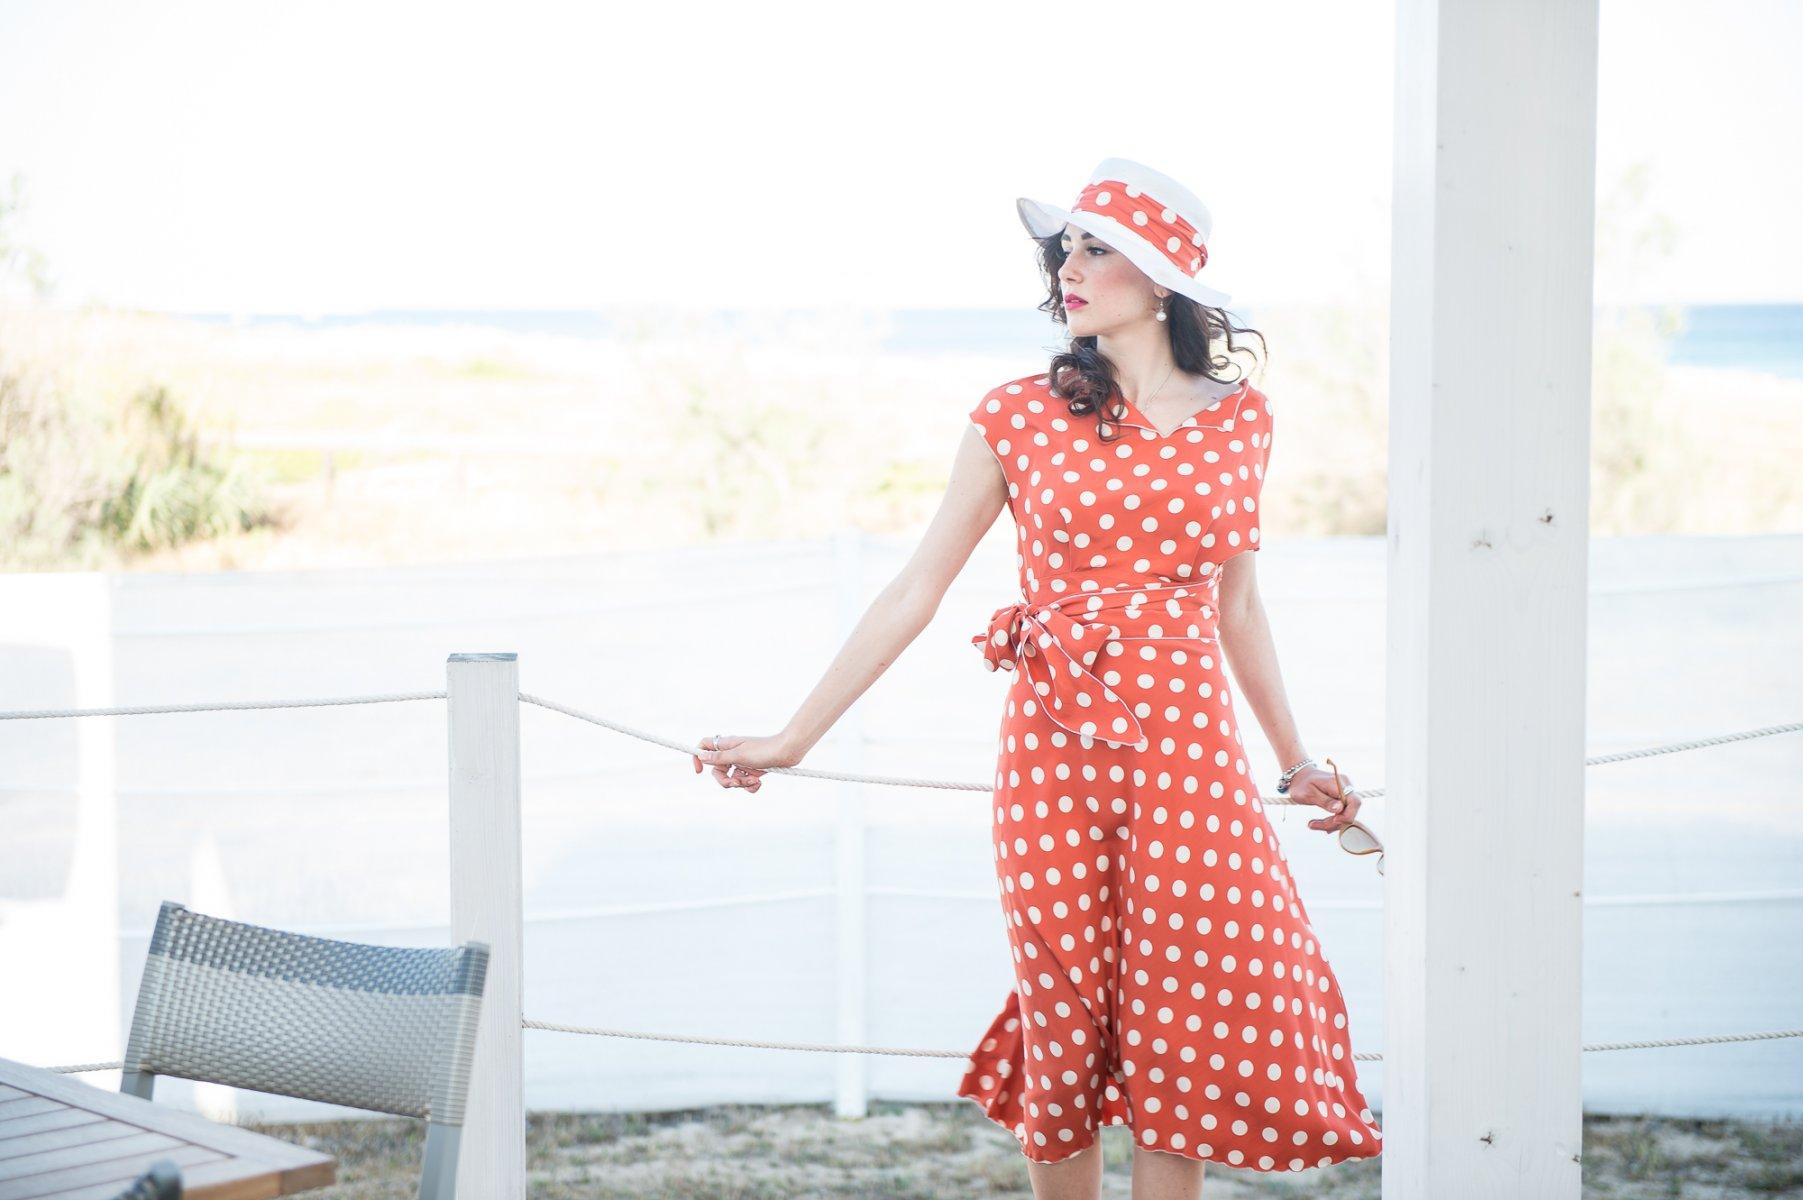 210-Pretty_Woman_MMD9494 Fashion/Adv